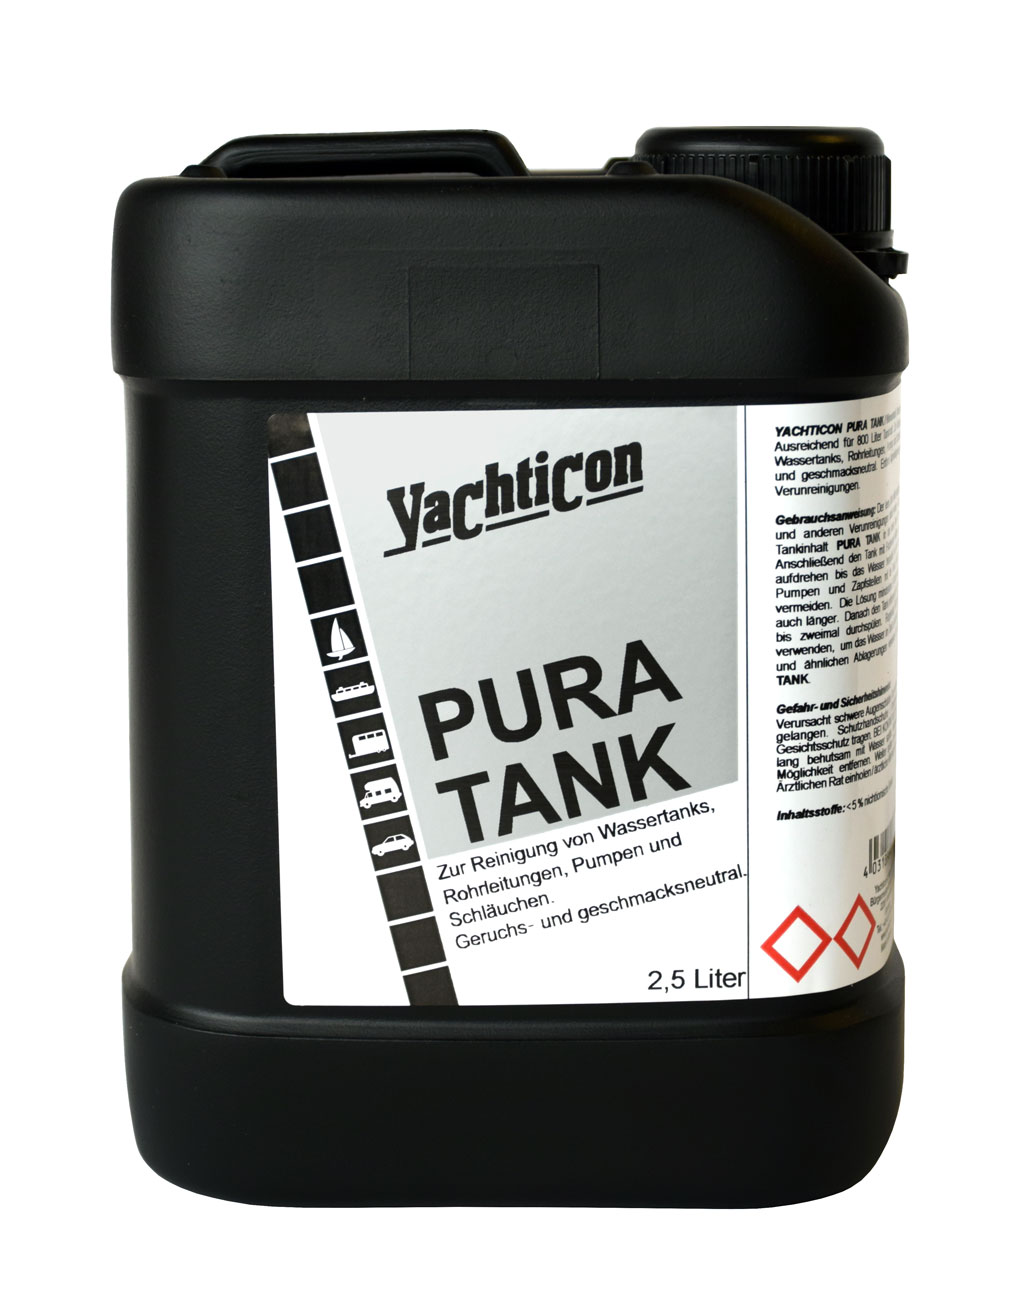 yachticon pura tank ohne chlor 2 5 liter. Black Bedroom Furniture Sets. Home Design Ideas